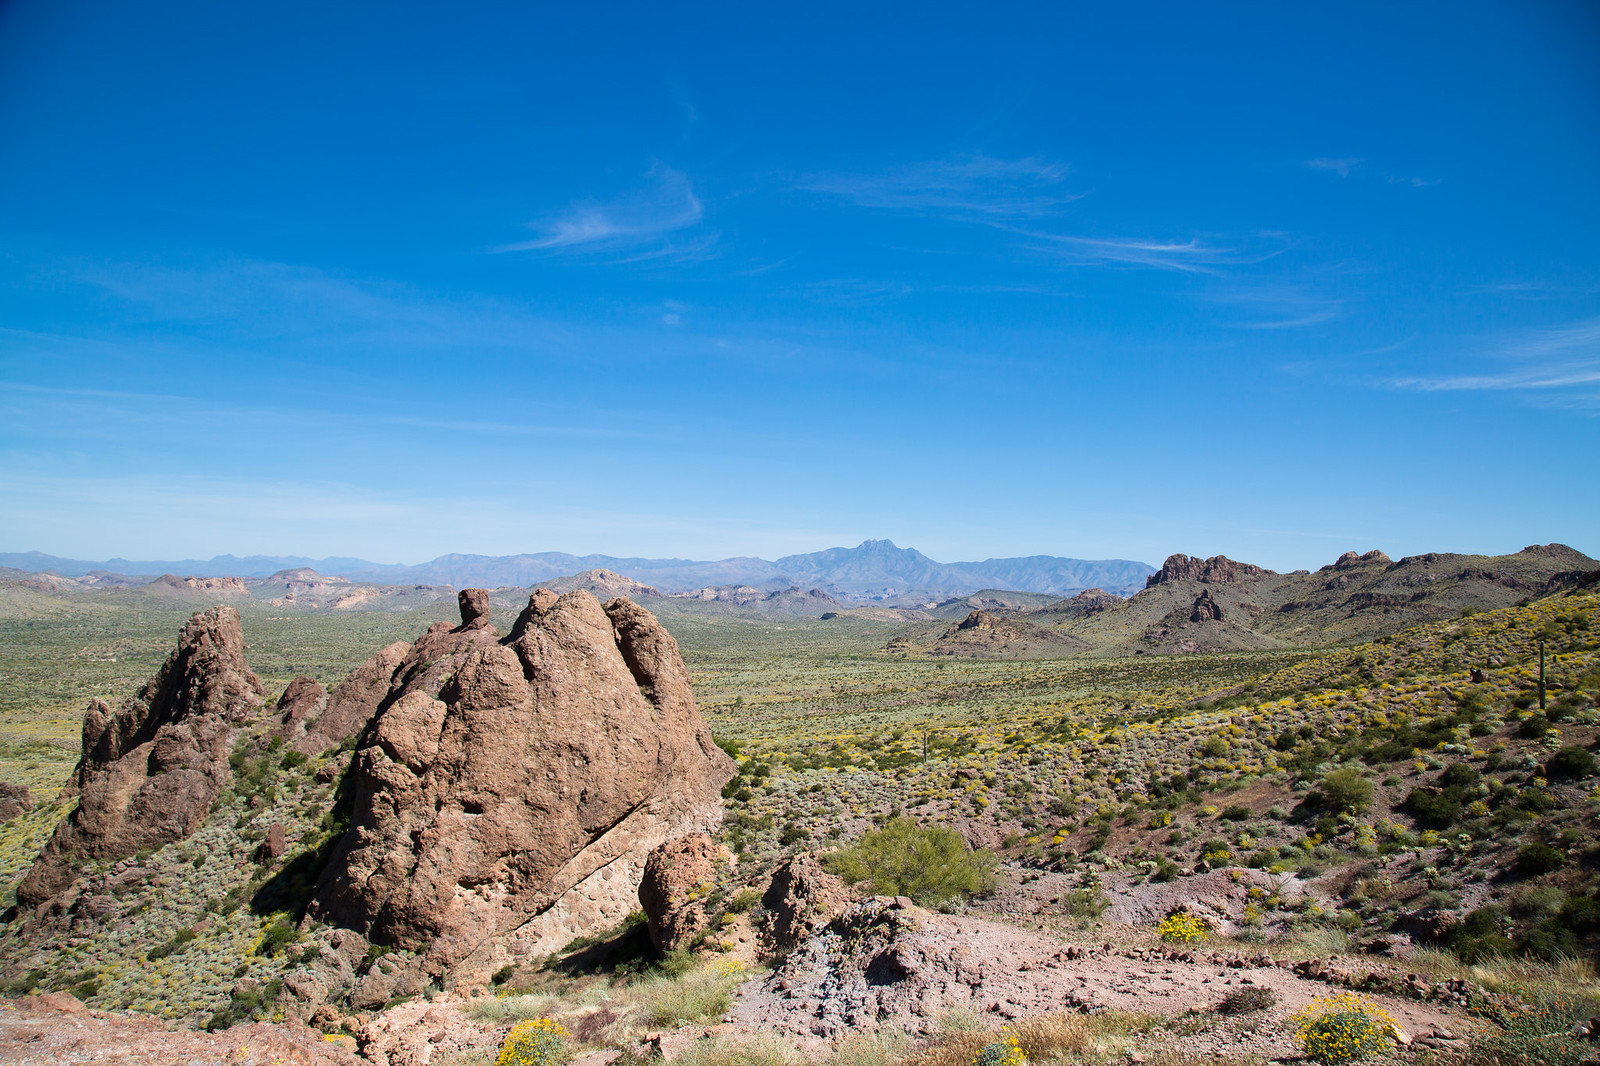 2015-03-12 Arizona-6448.jpg